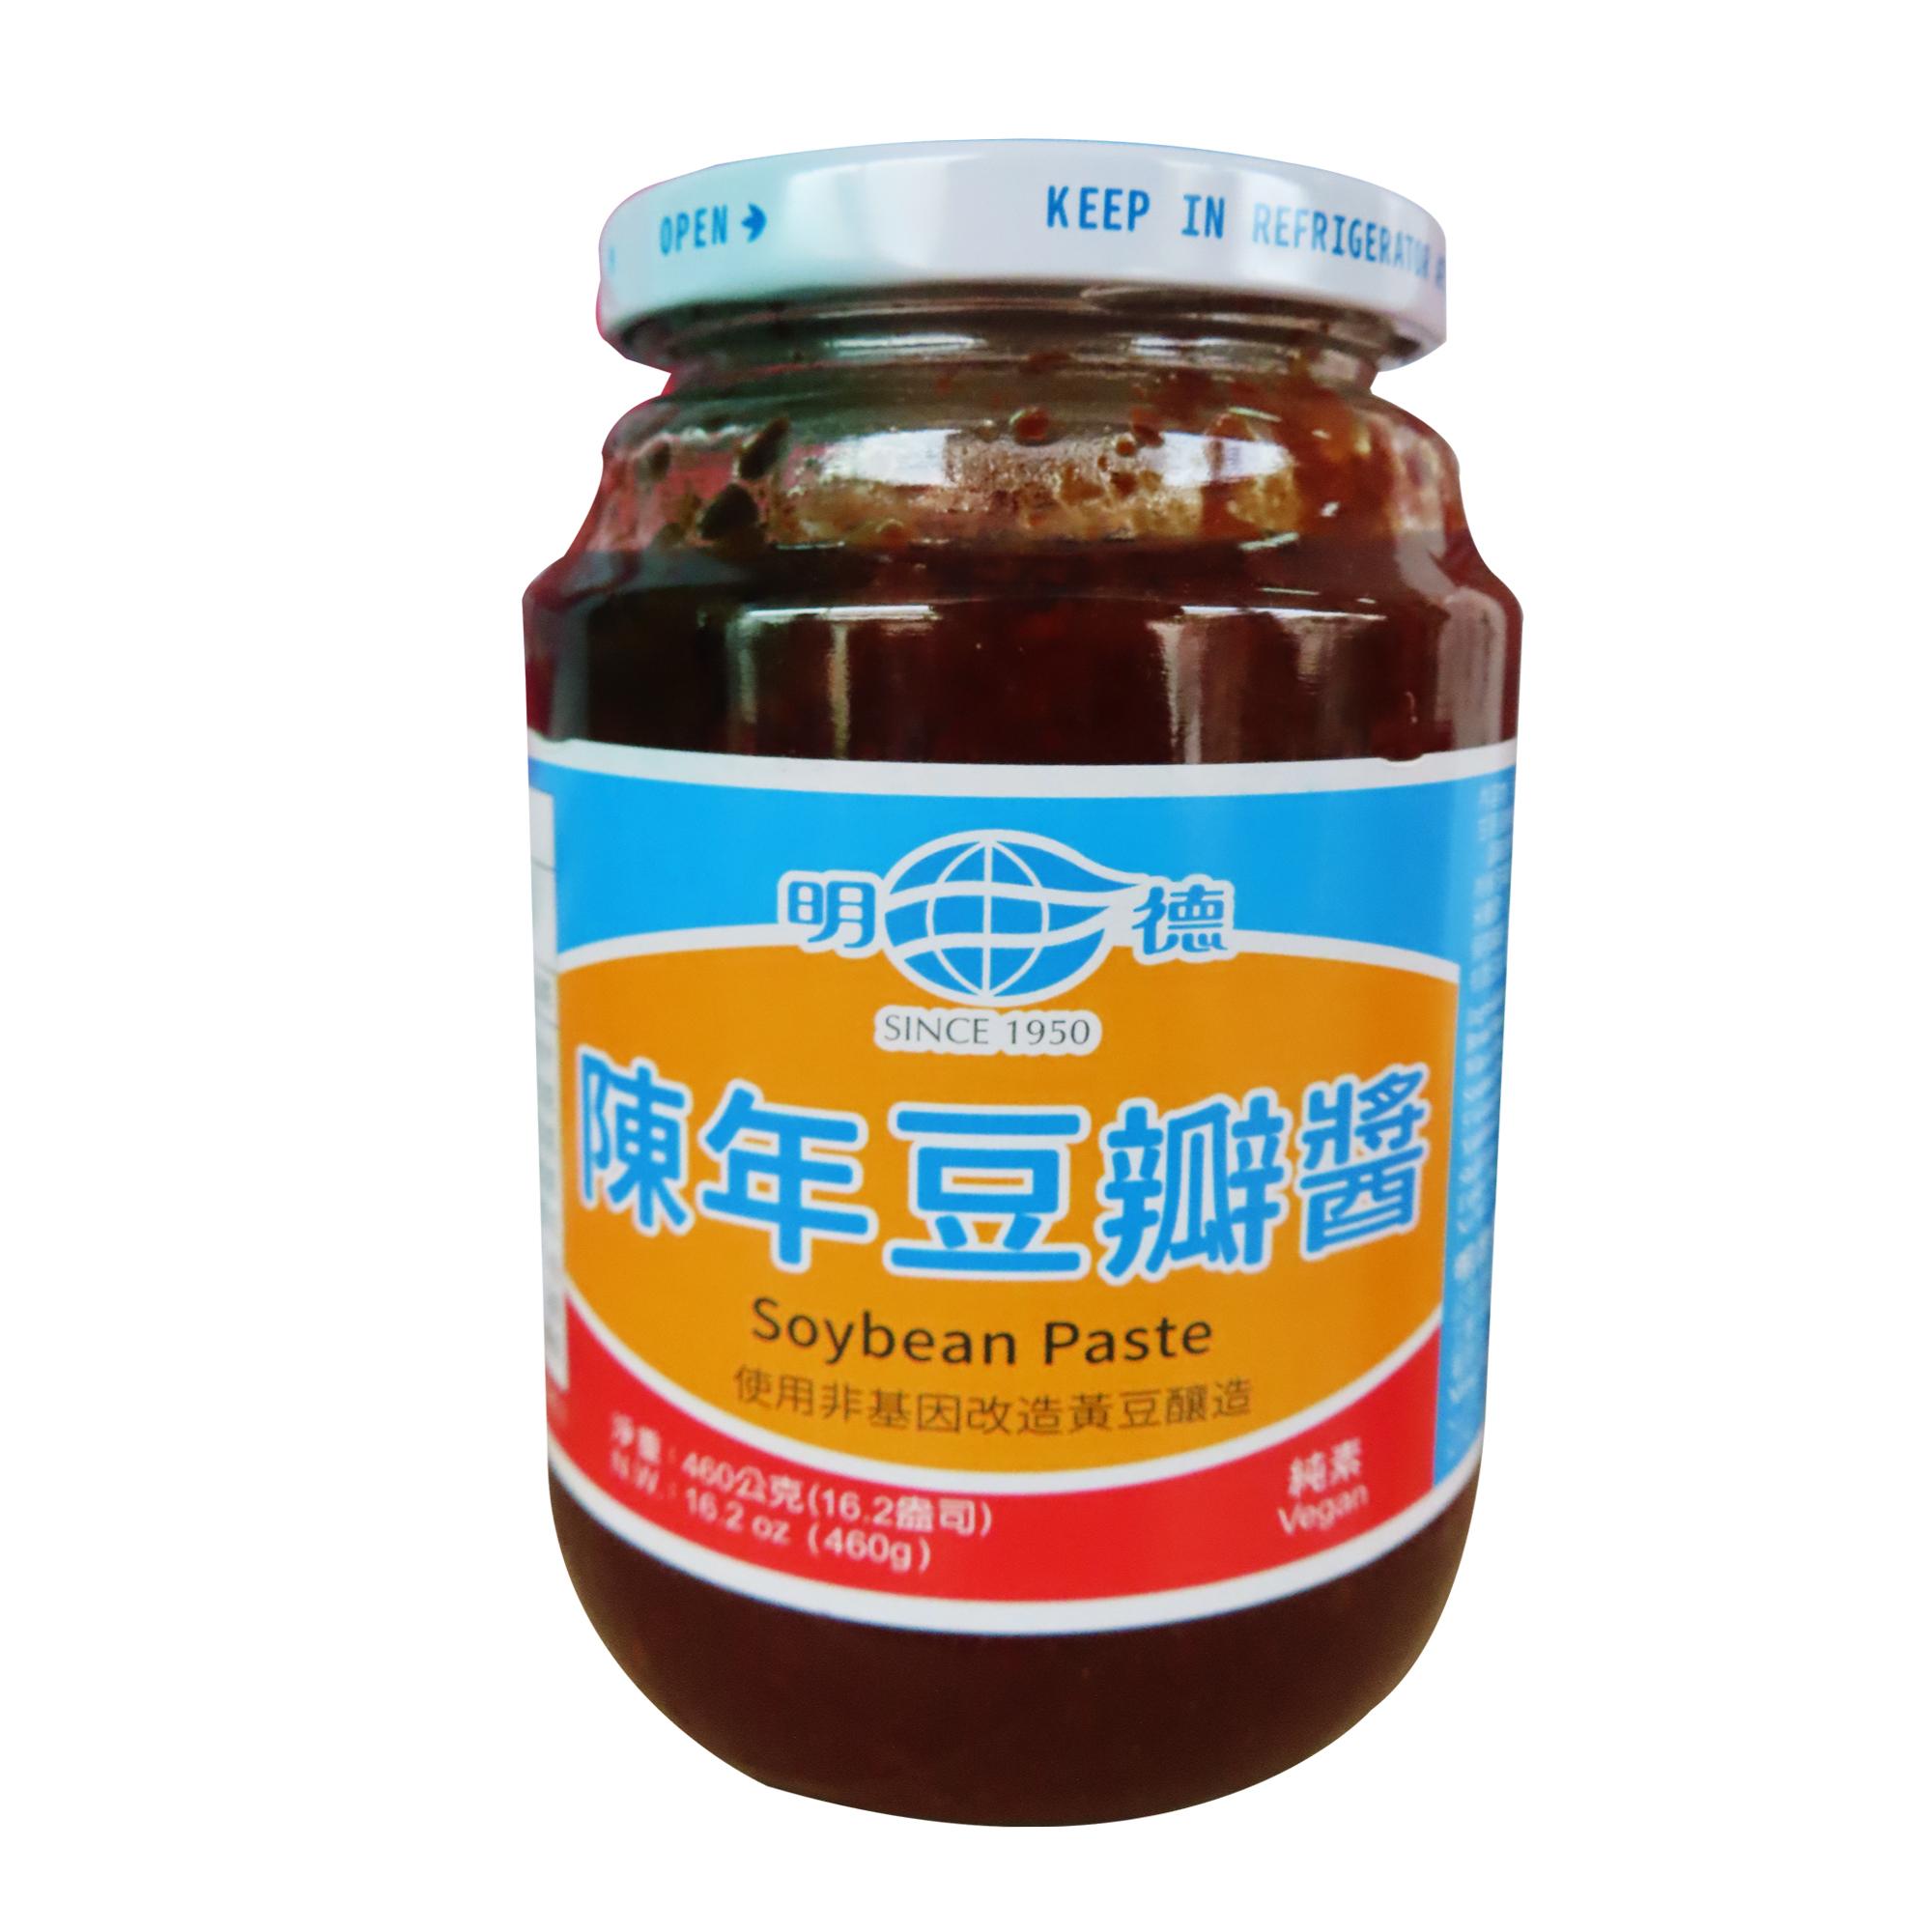 Image Soy Bean Paste 明德 - 陈年豆瓣酱 460grams